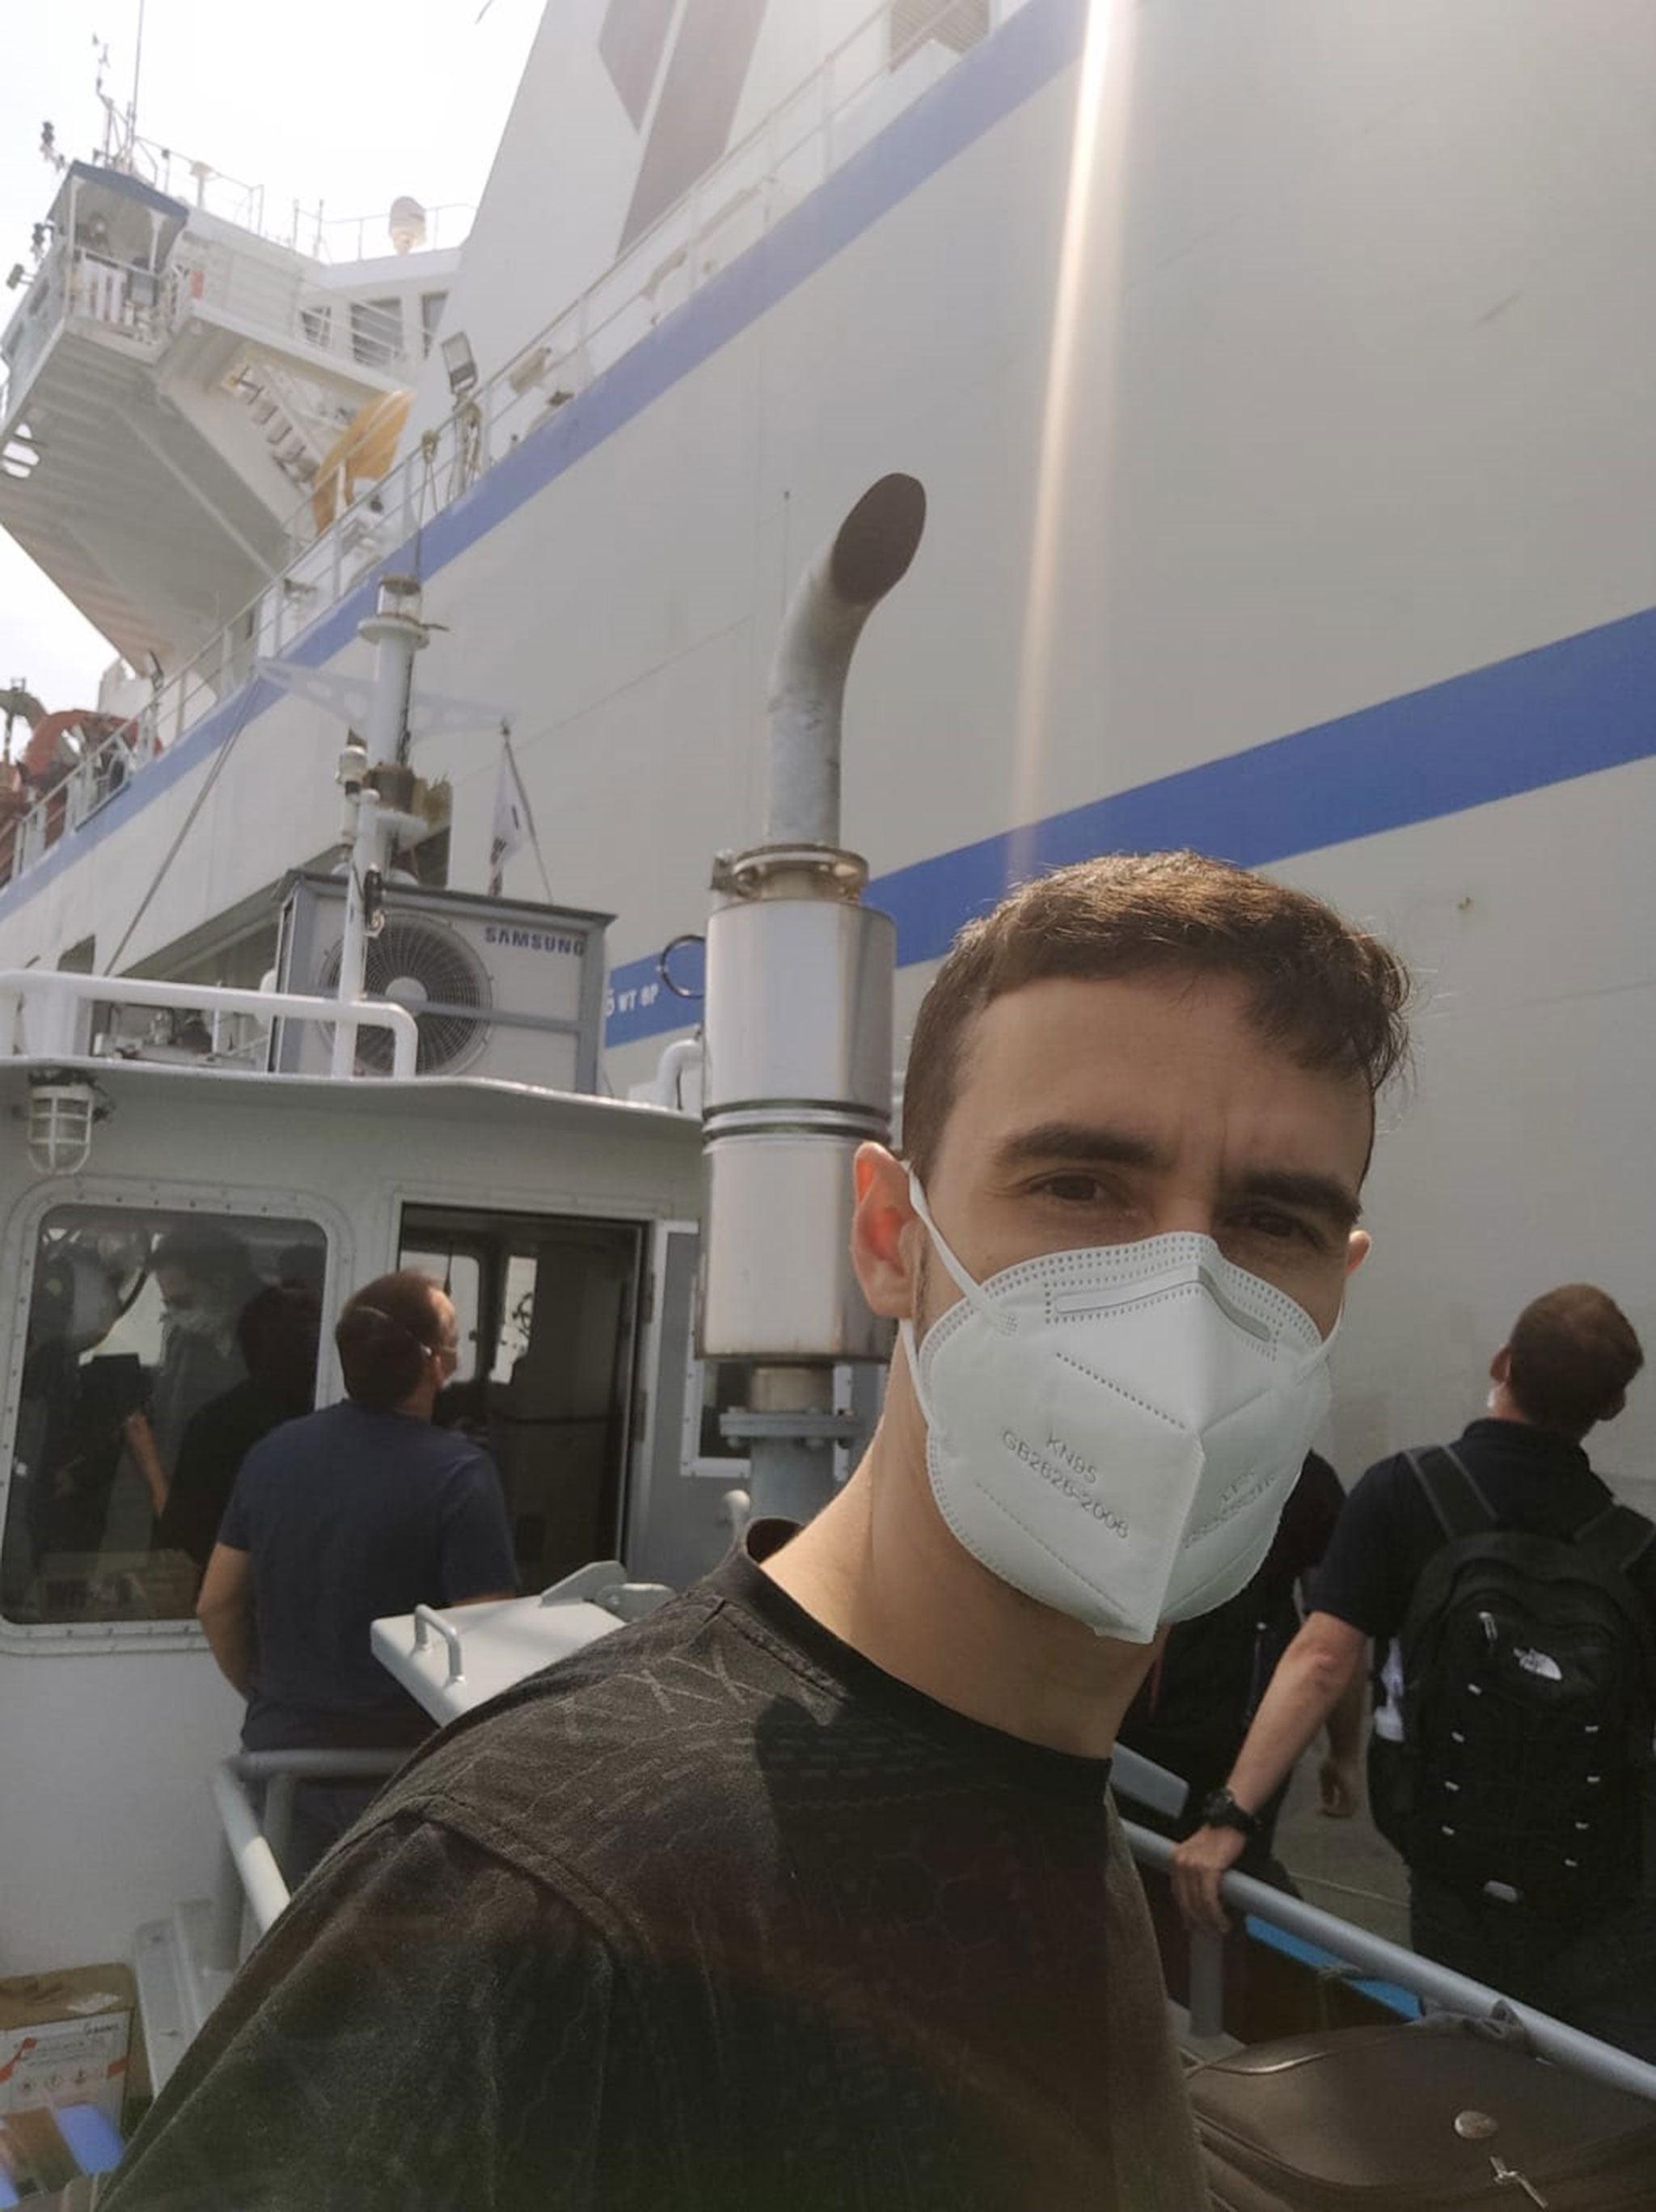 David Costa embarking with security measures